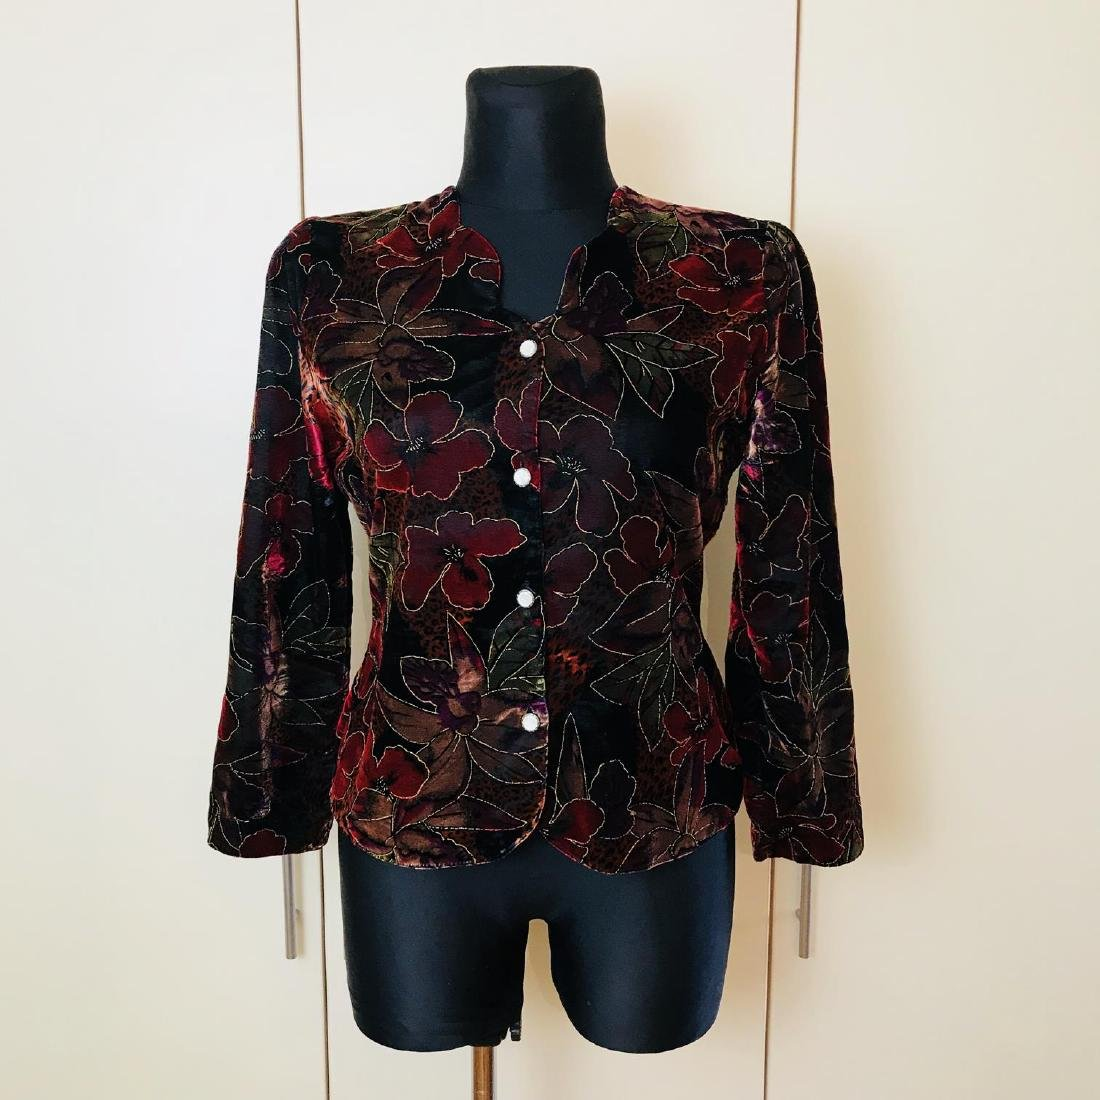 Vintage Women's Jacket Blazer Top Size US 10 EUR 40